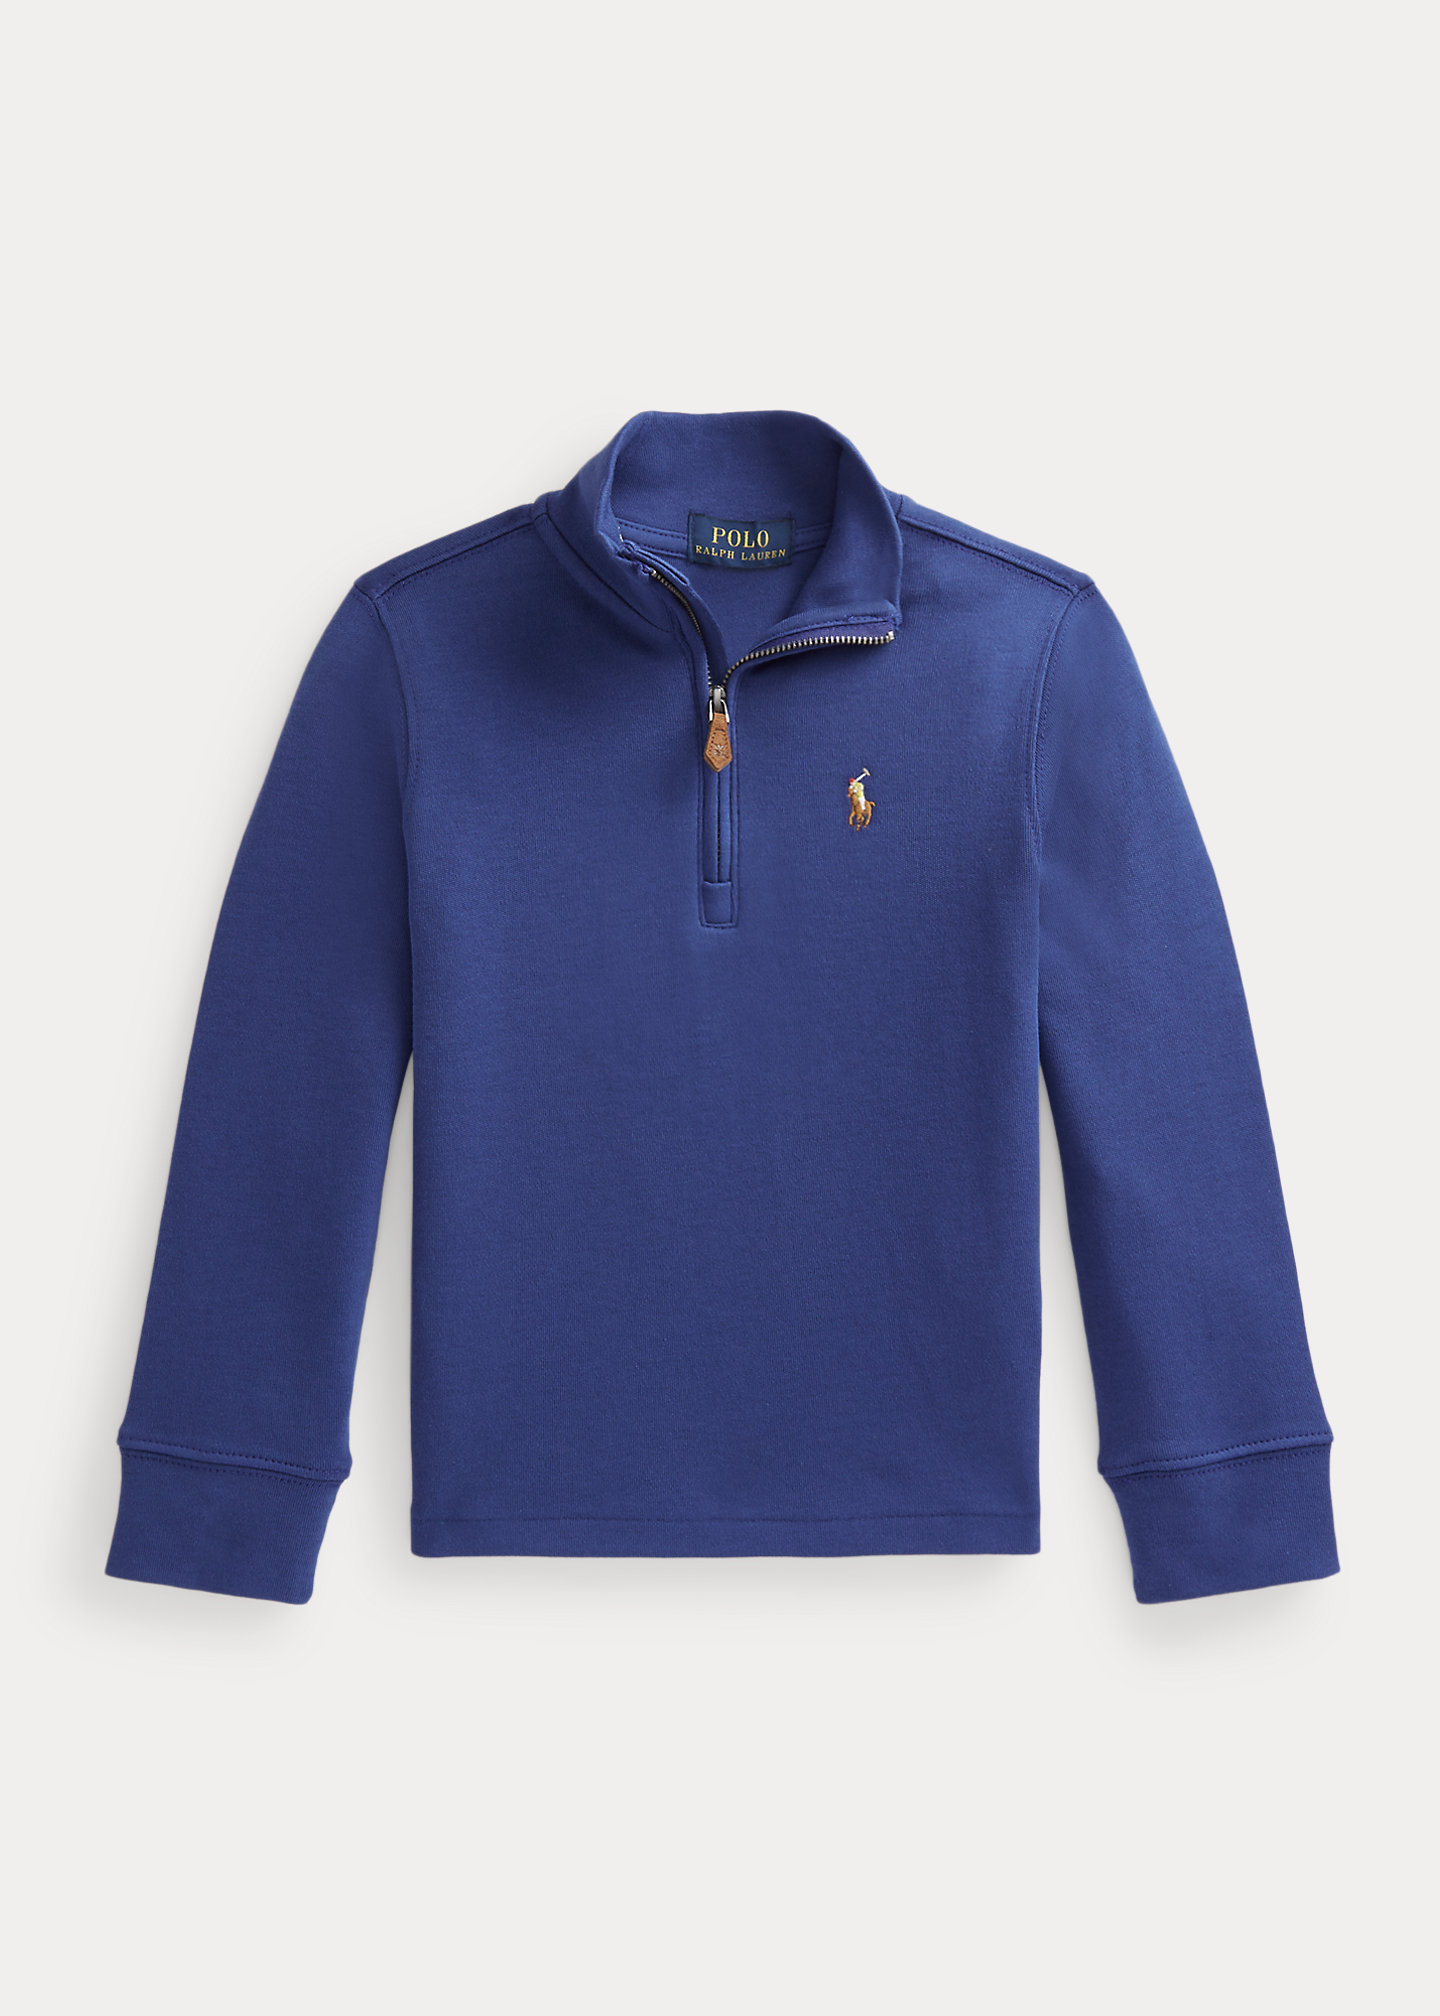 Polo Ralph Lauren Cotton Interlock Quarter Zip Pullover